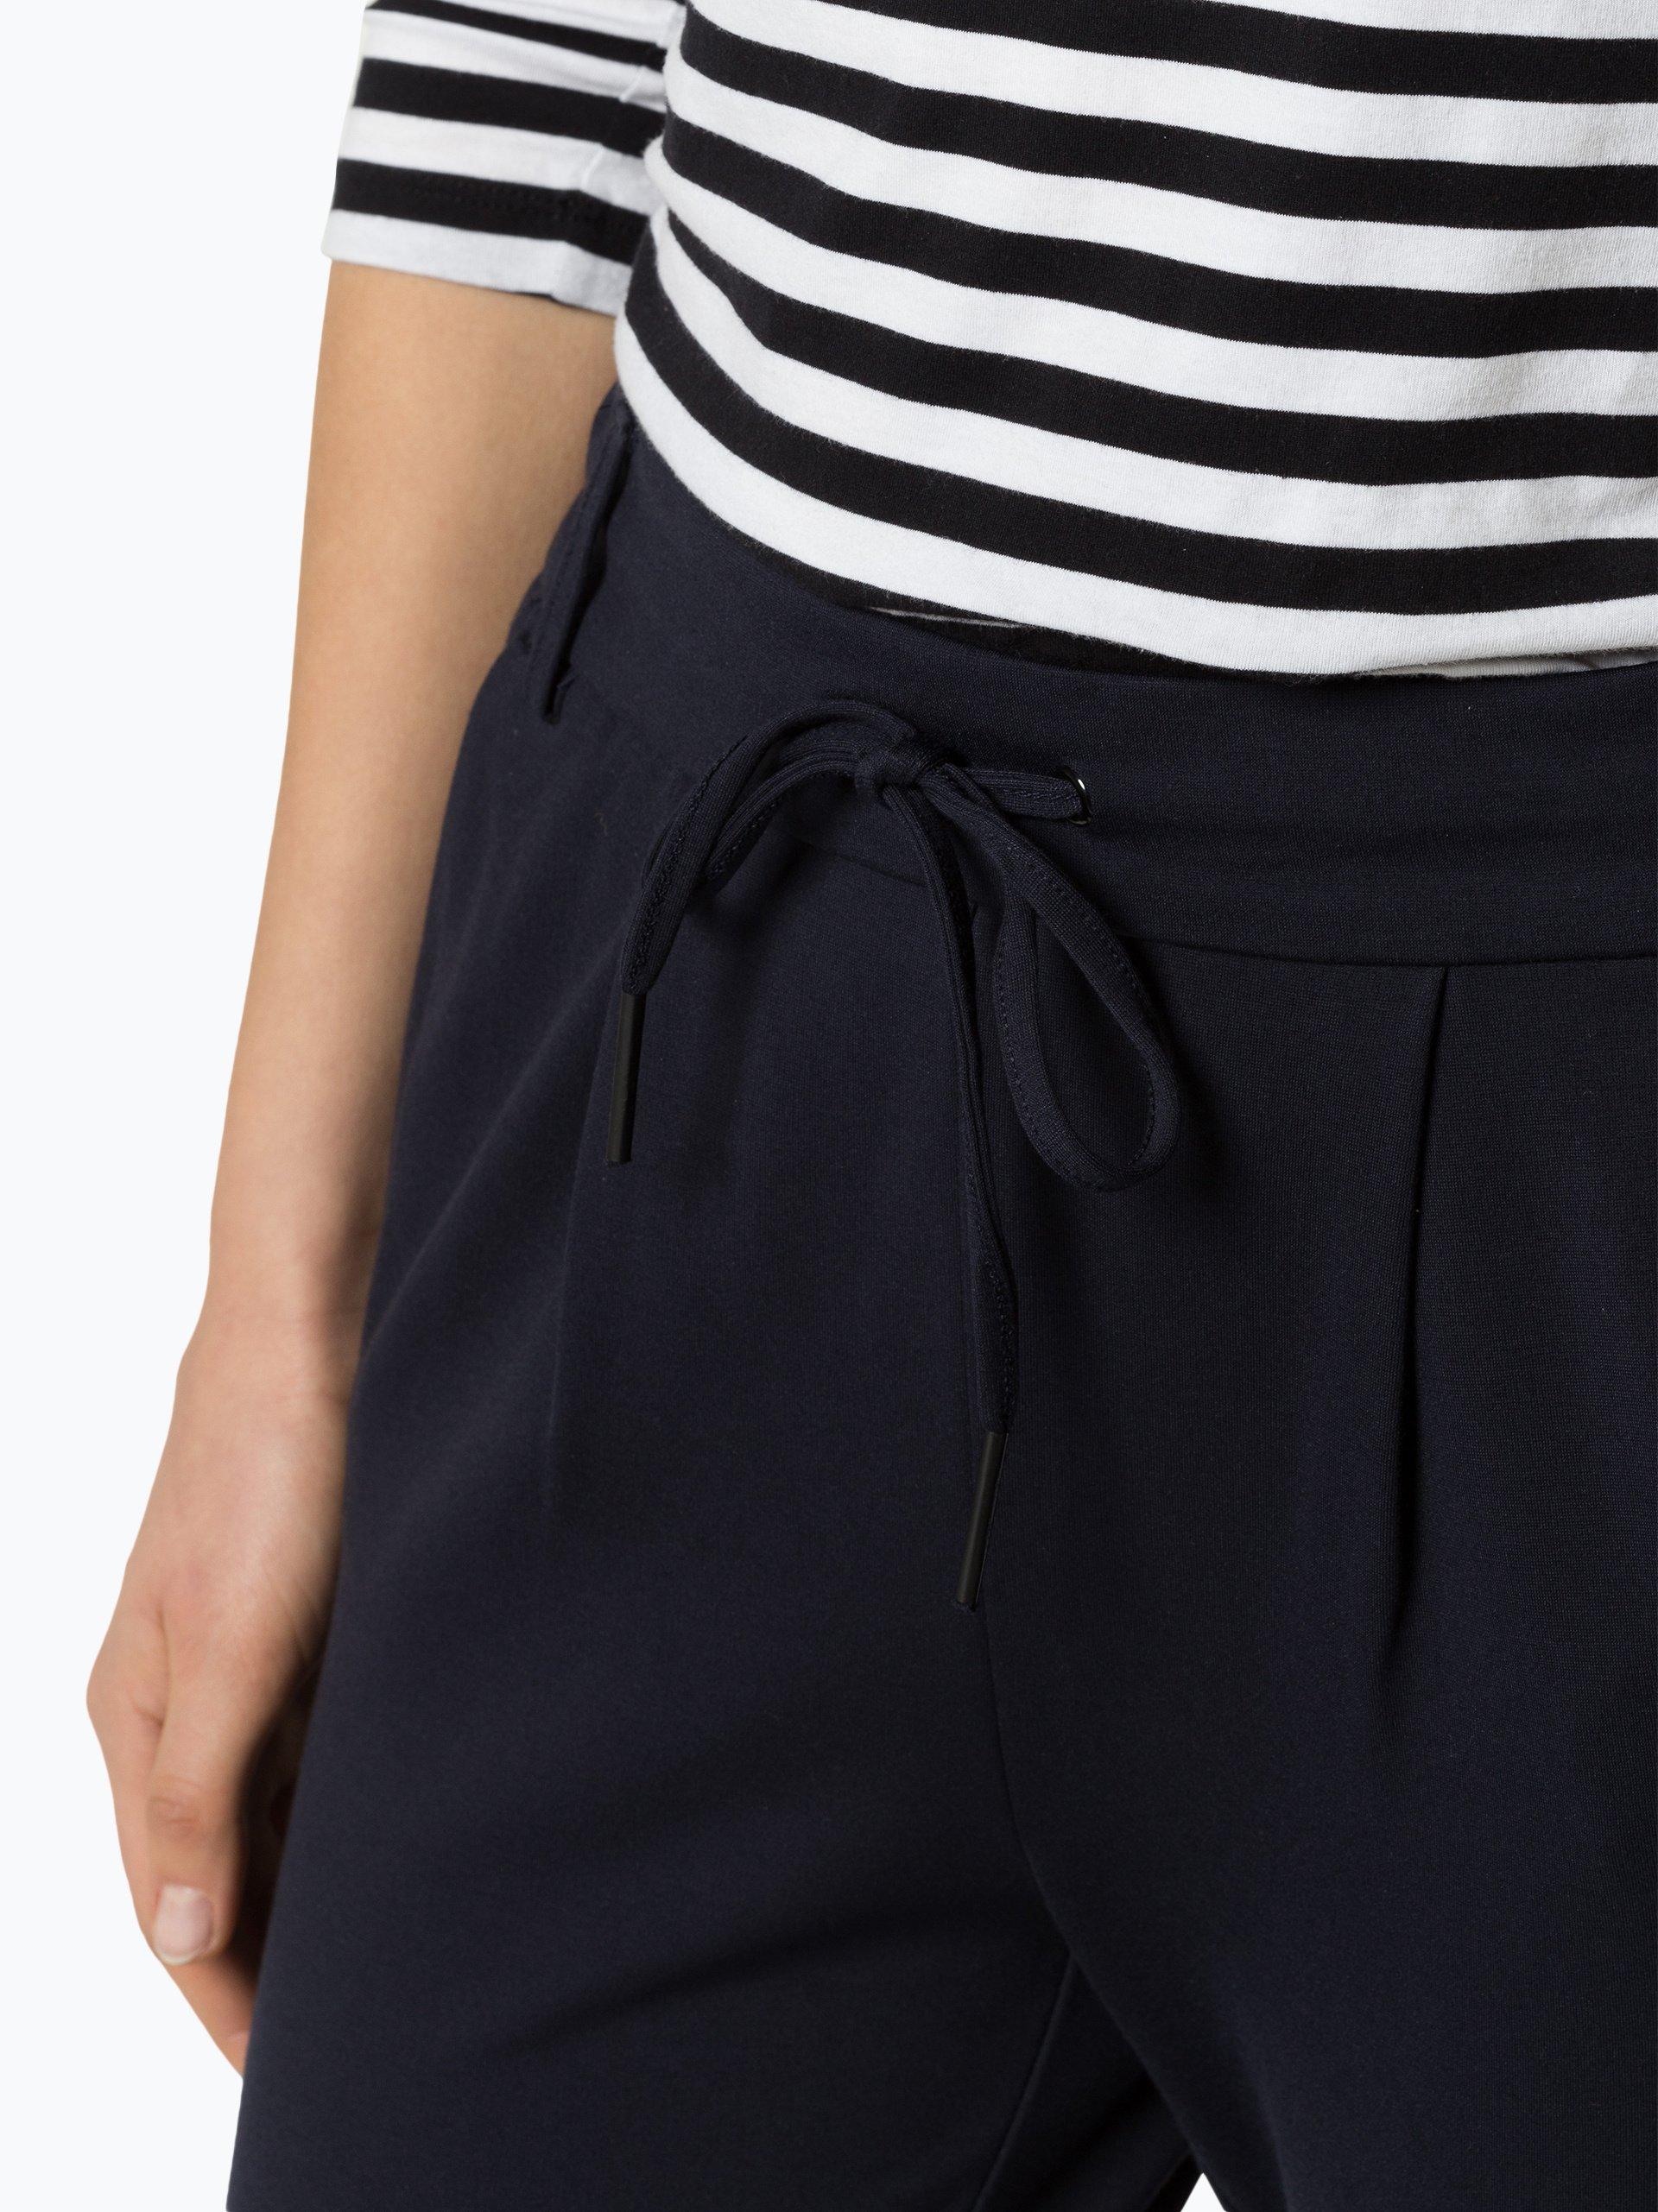 ONLY Spodnie damskie – Onlpoptrash